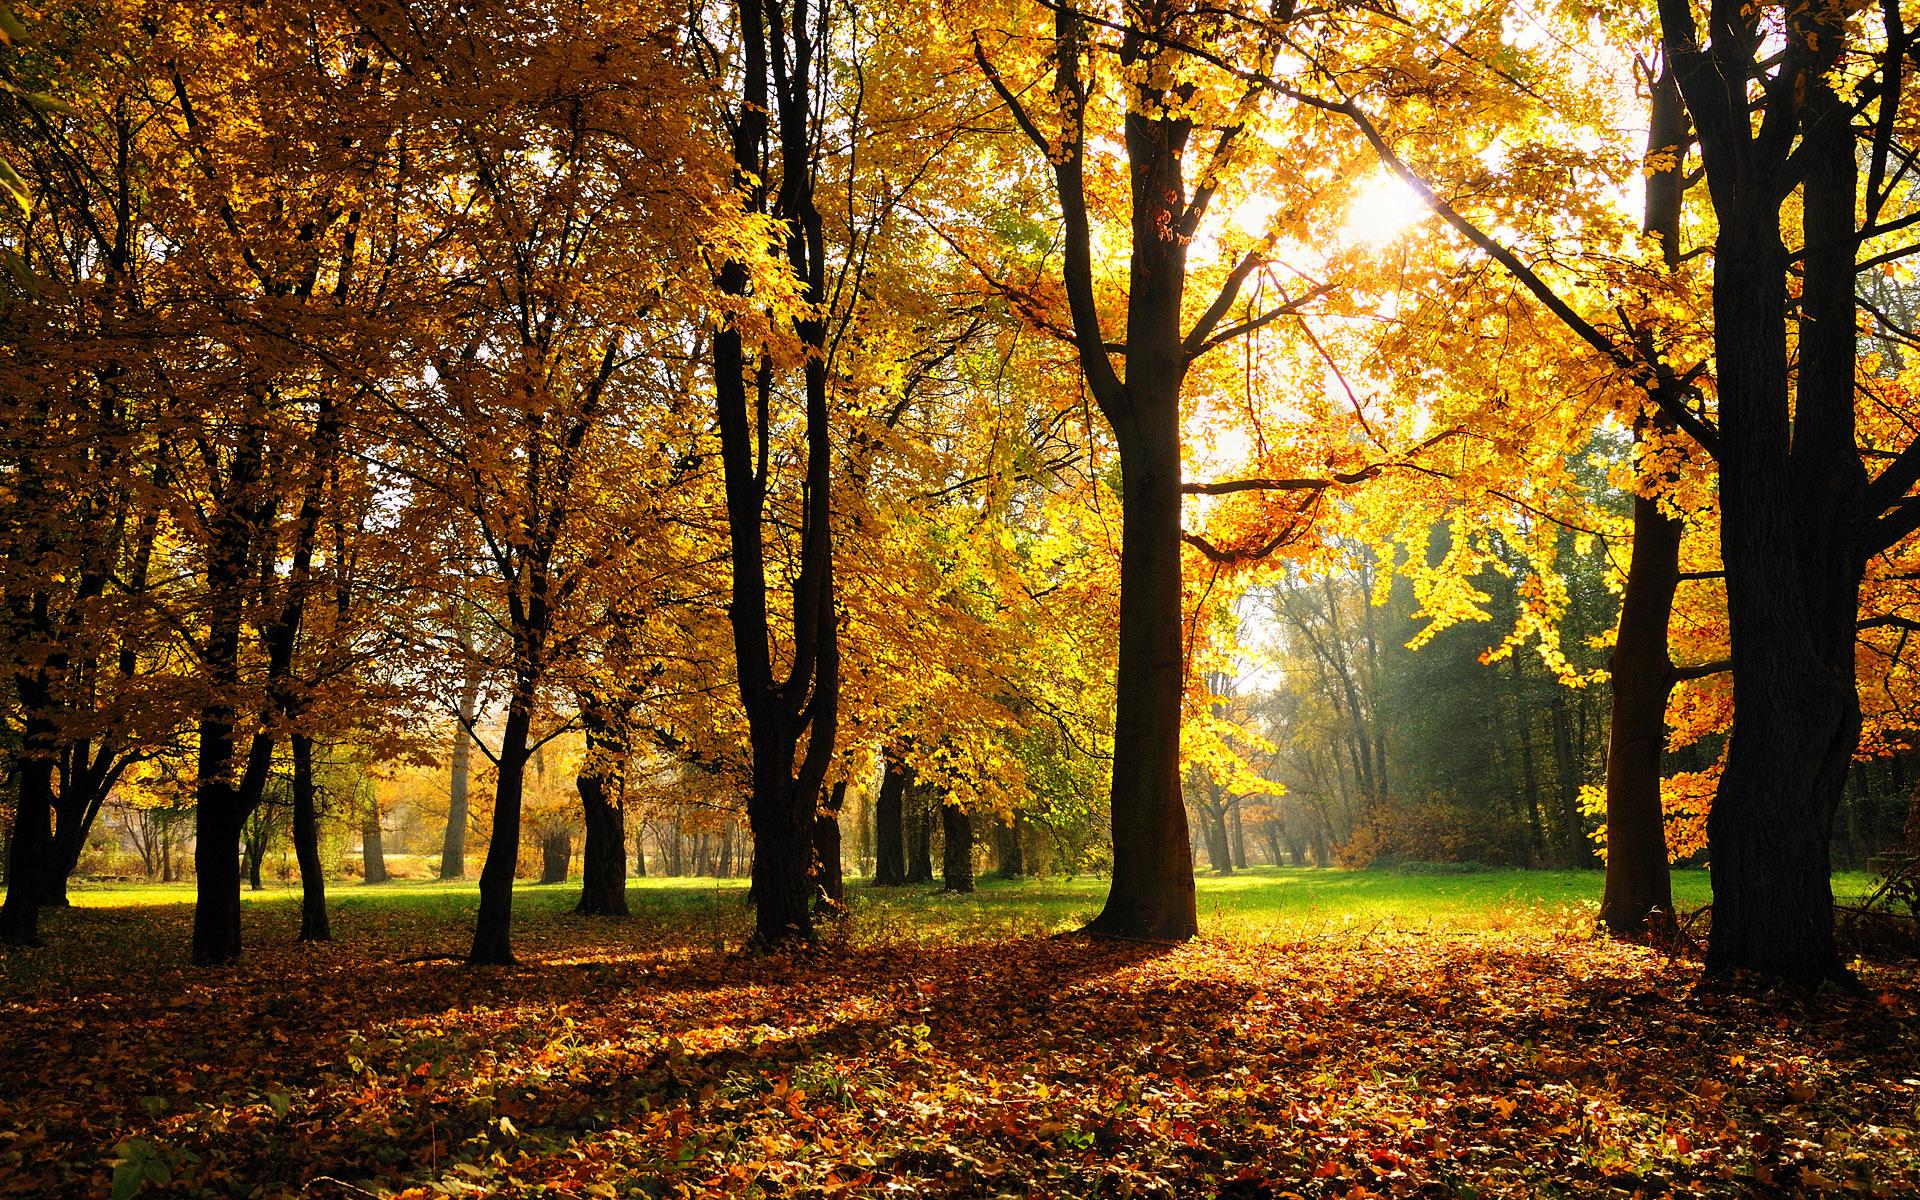 Autumn Season Wallpapers HD Wallpapers 1920x1200